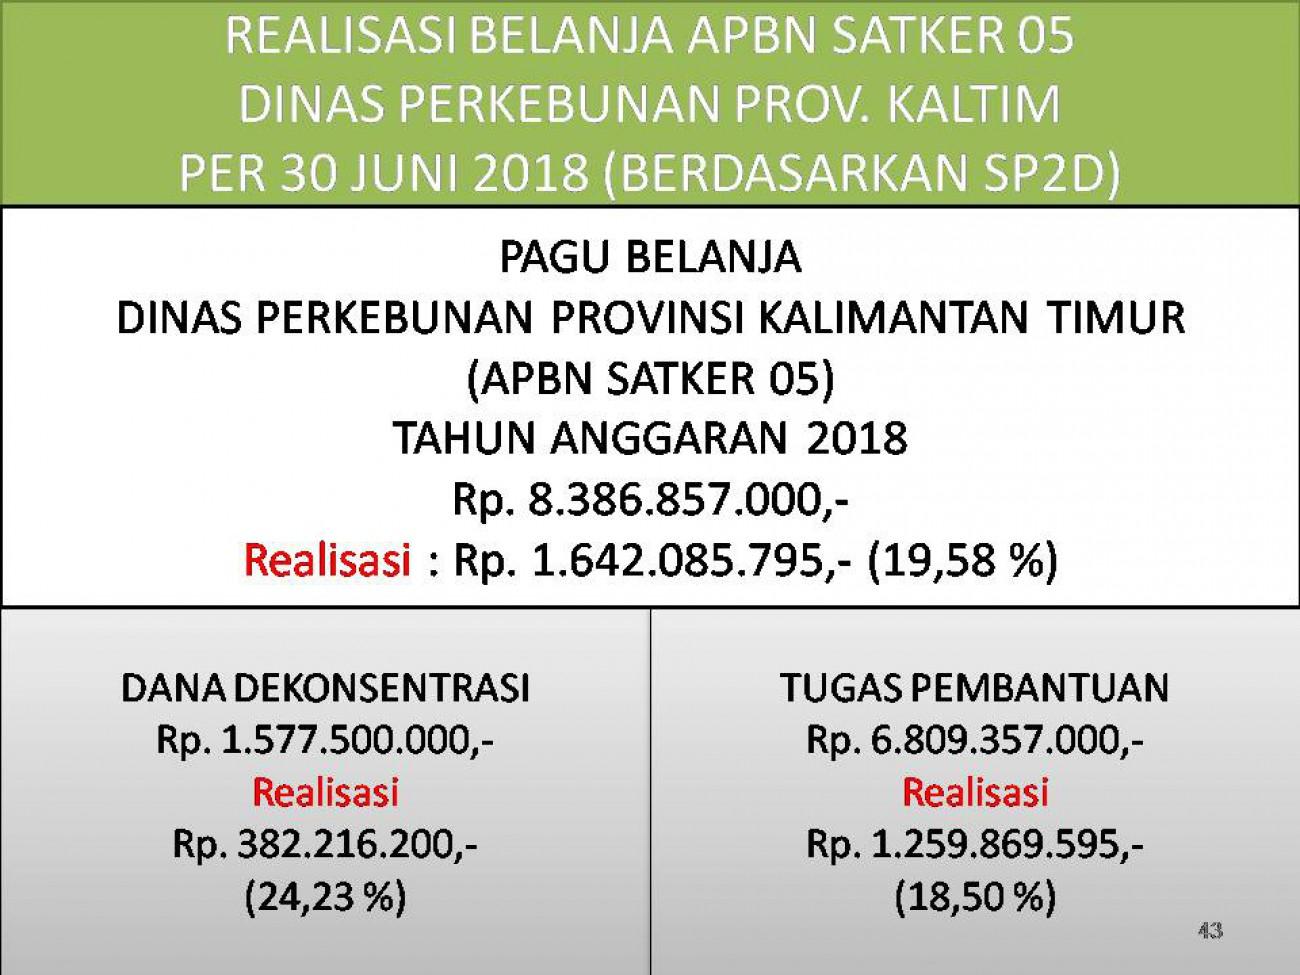 Laporan Realisasi APBN Satker 05 (Direktorat Jenderal Perkebunan) Dinas Perkebunan Prov. Kaltim Bulan Juni 2018